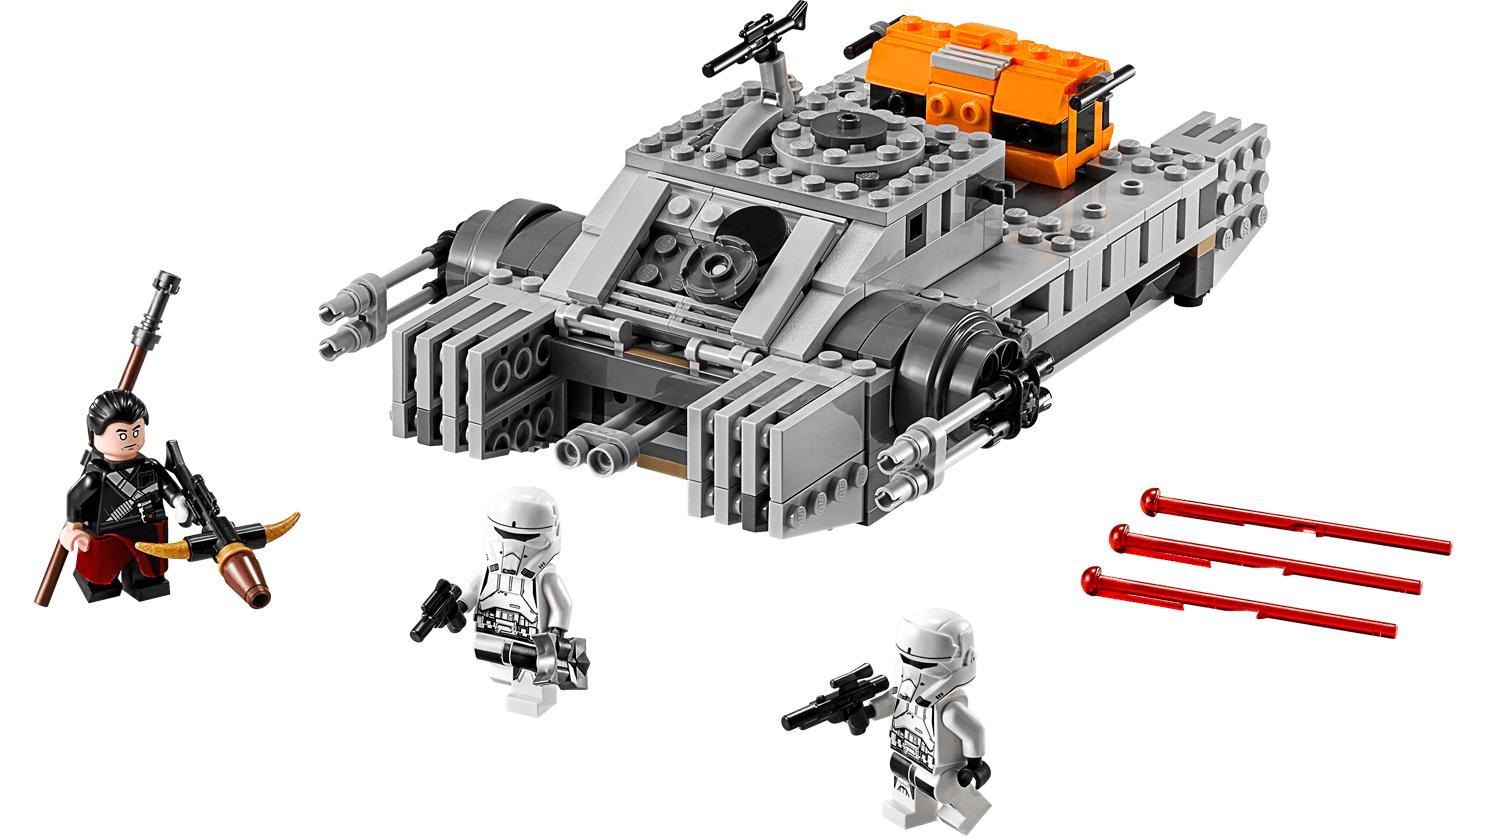 toys n bricks lego news site sales deals reviews. Black Bedroom Furniture Sets. Home Design Ideas